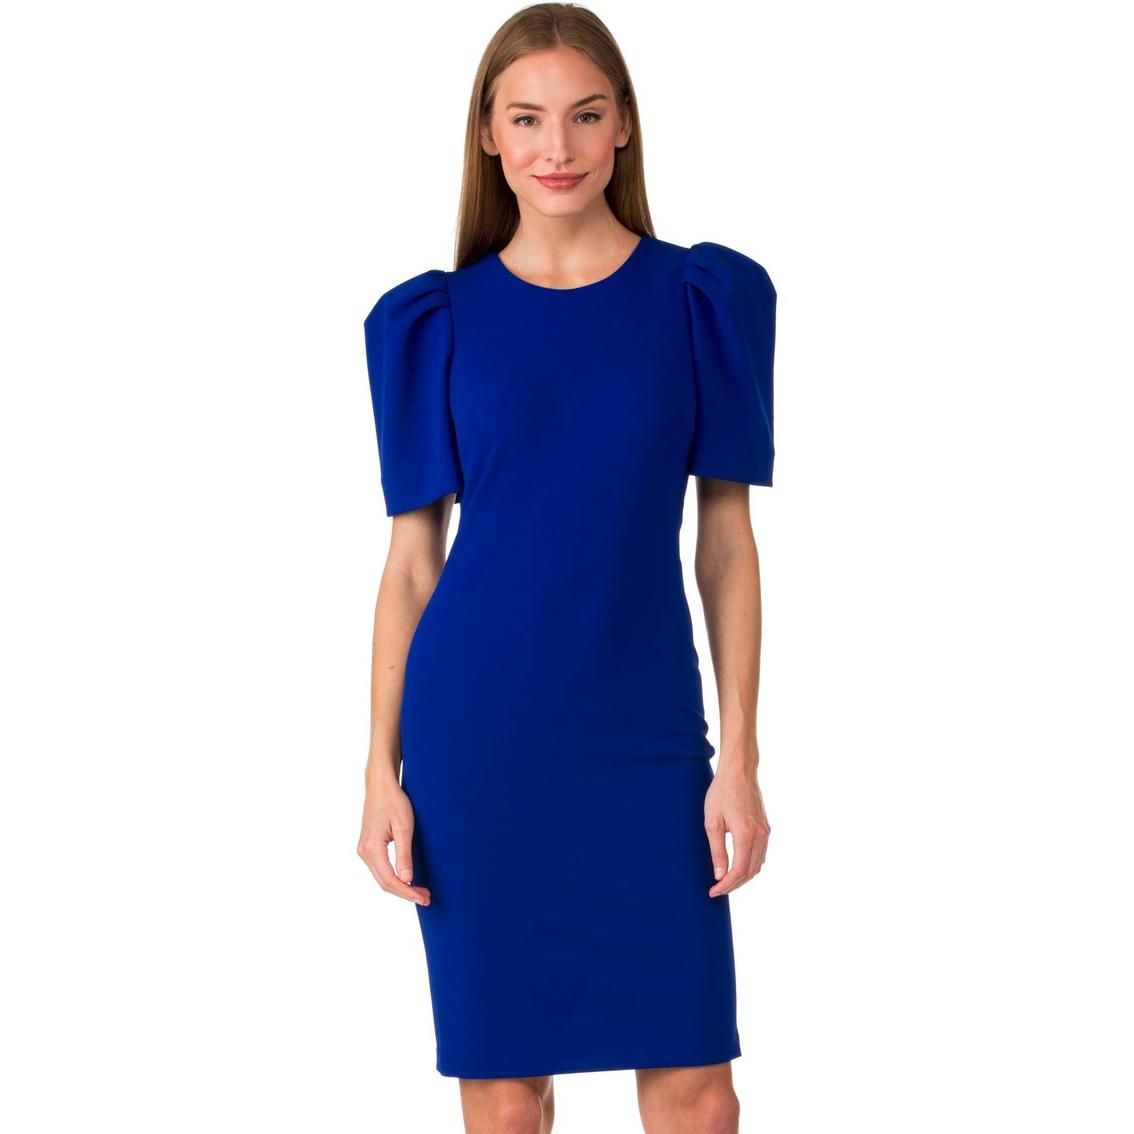 cf930f73 Calvin Klein Ruffled Sleeve Sheath Dress | Dresses | Apparel | Shop ...